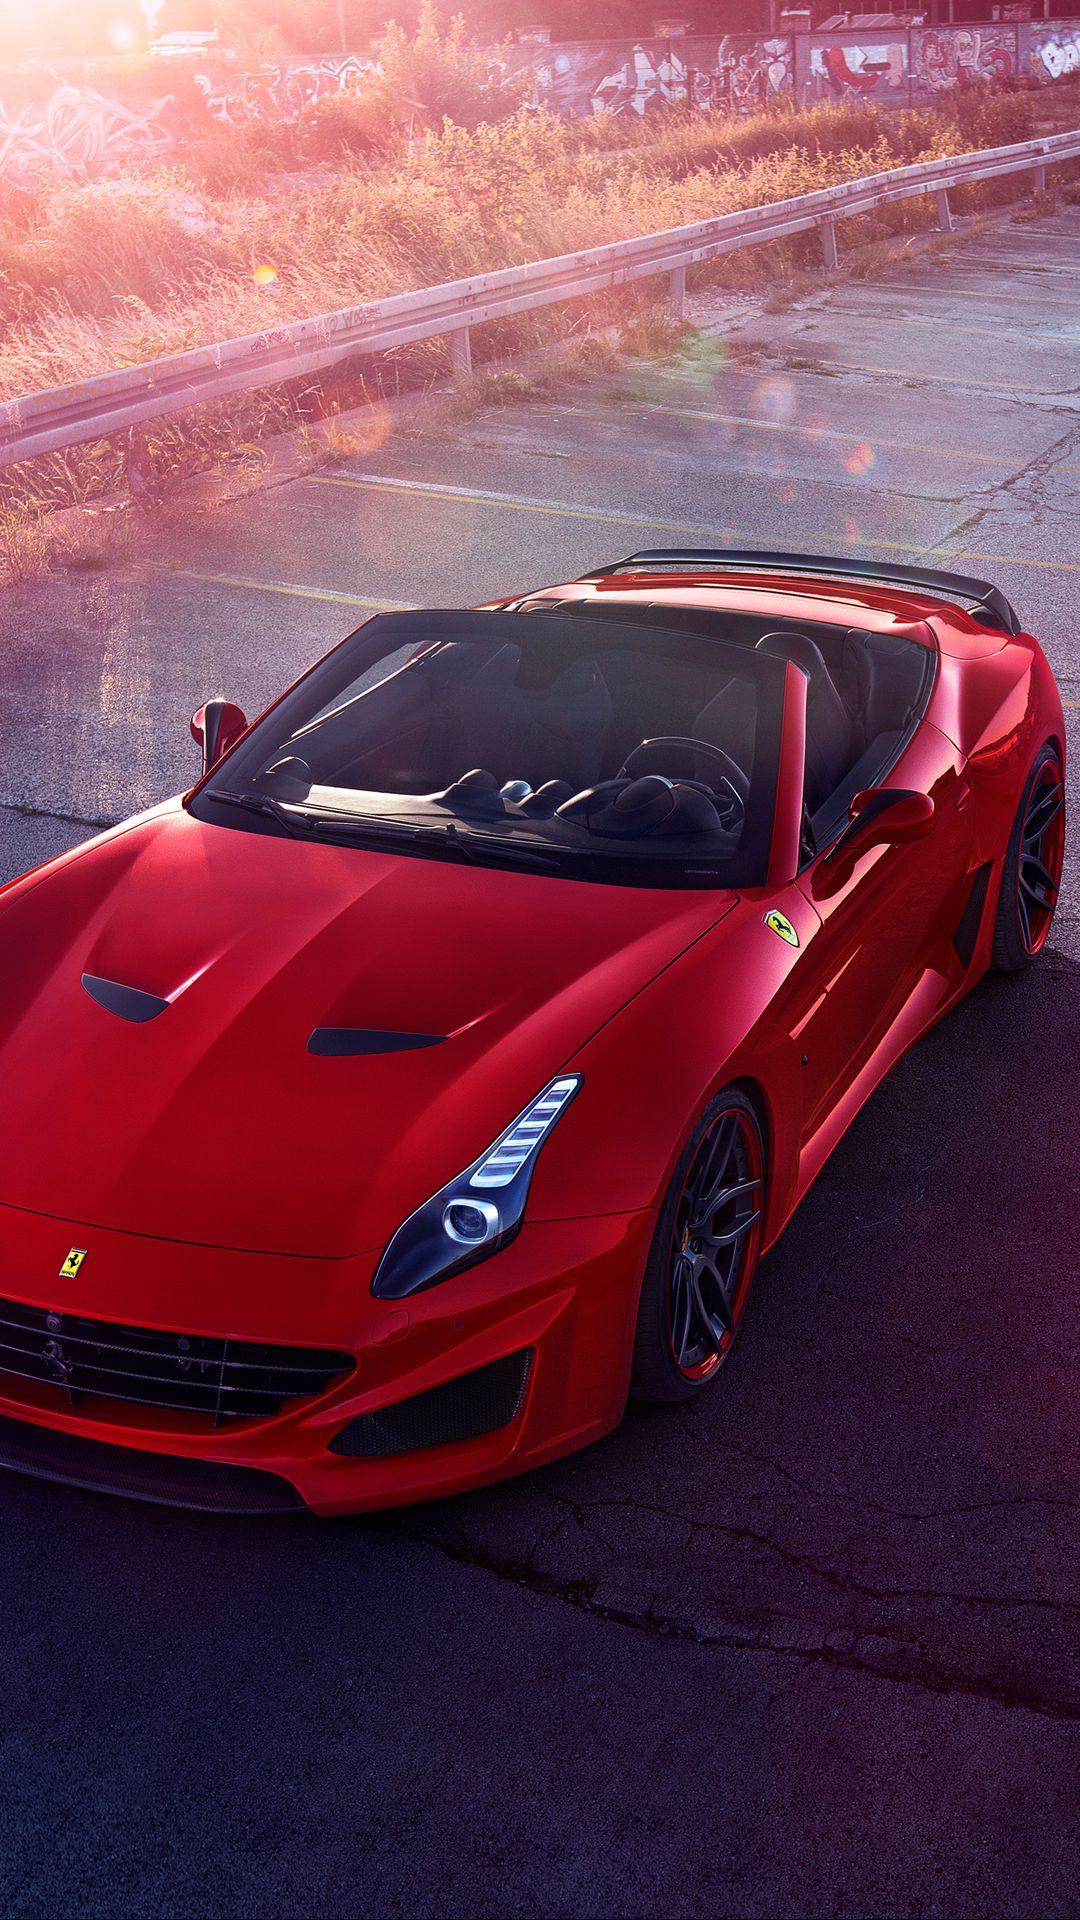 1080x1920 Wallpaper ferrari, sports car, convertible, red